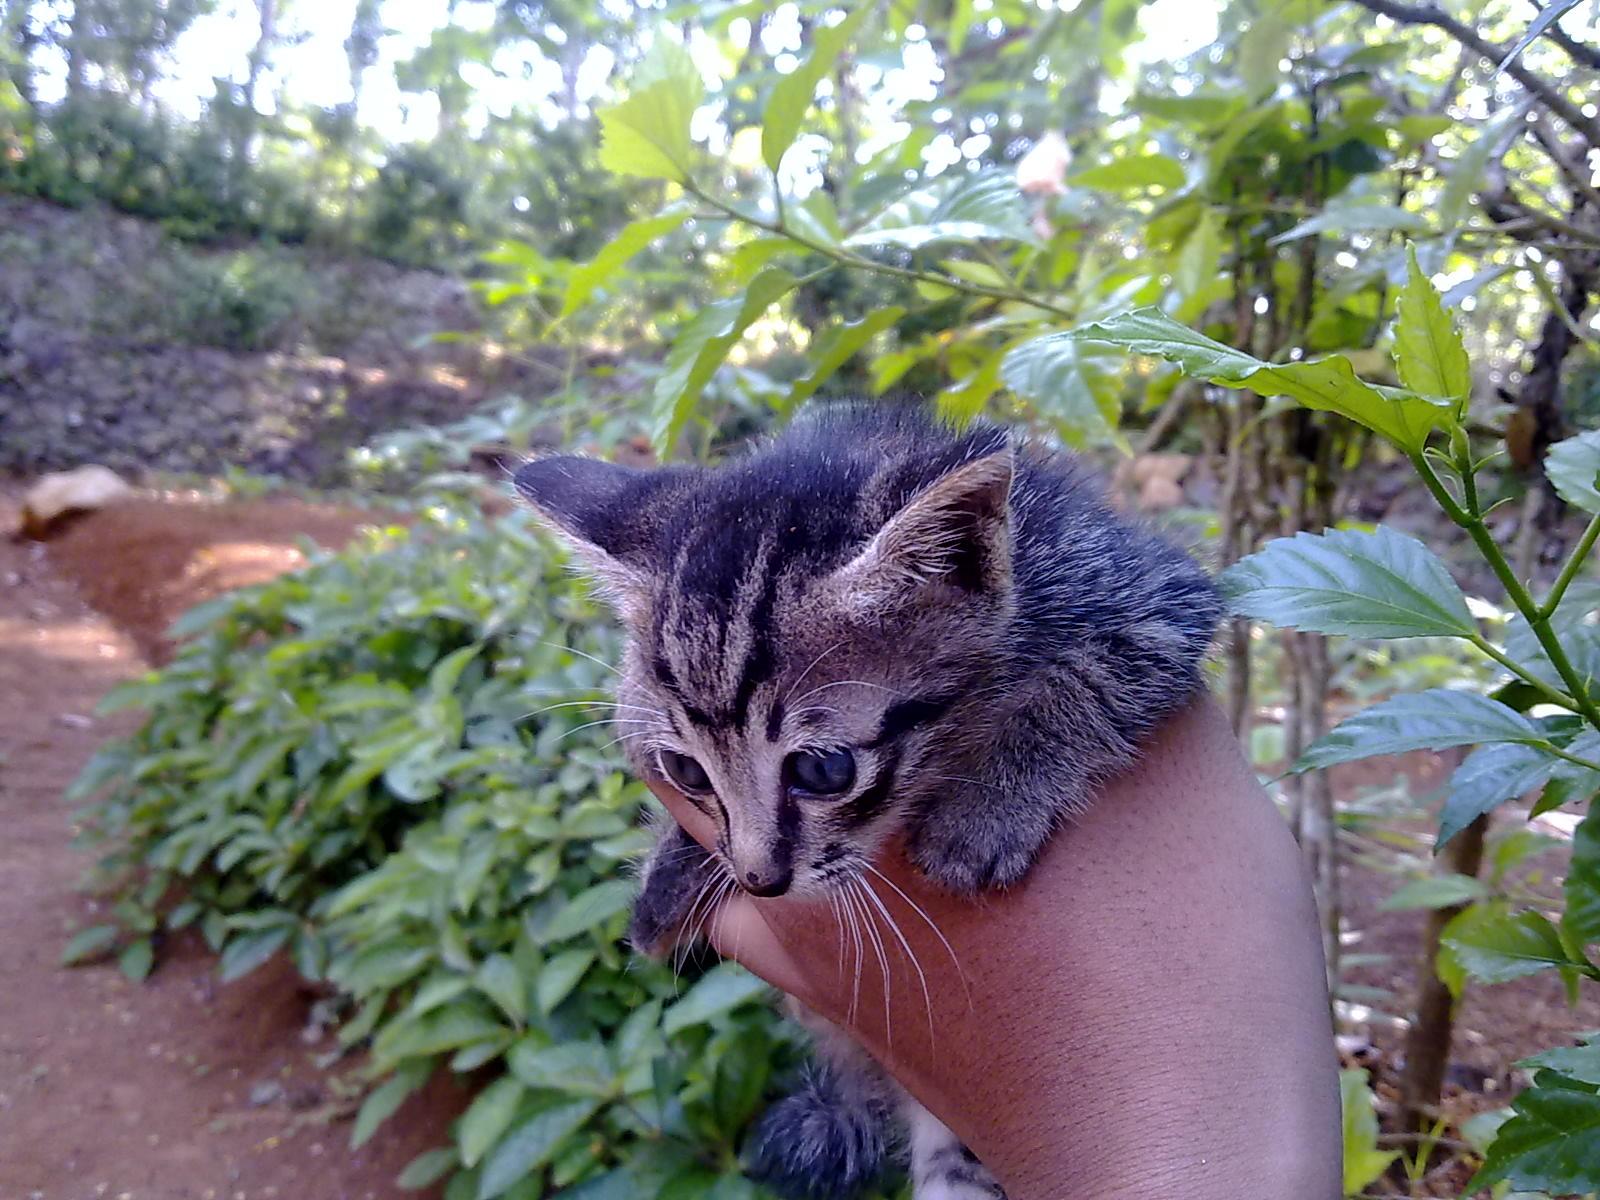 Foto Gambar Kucing Sedang Menyusu Lucu Sekali AhsanfileCom